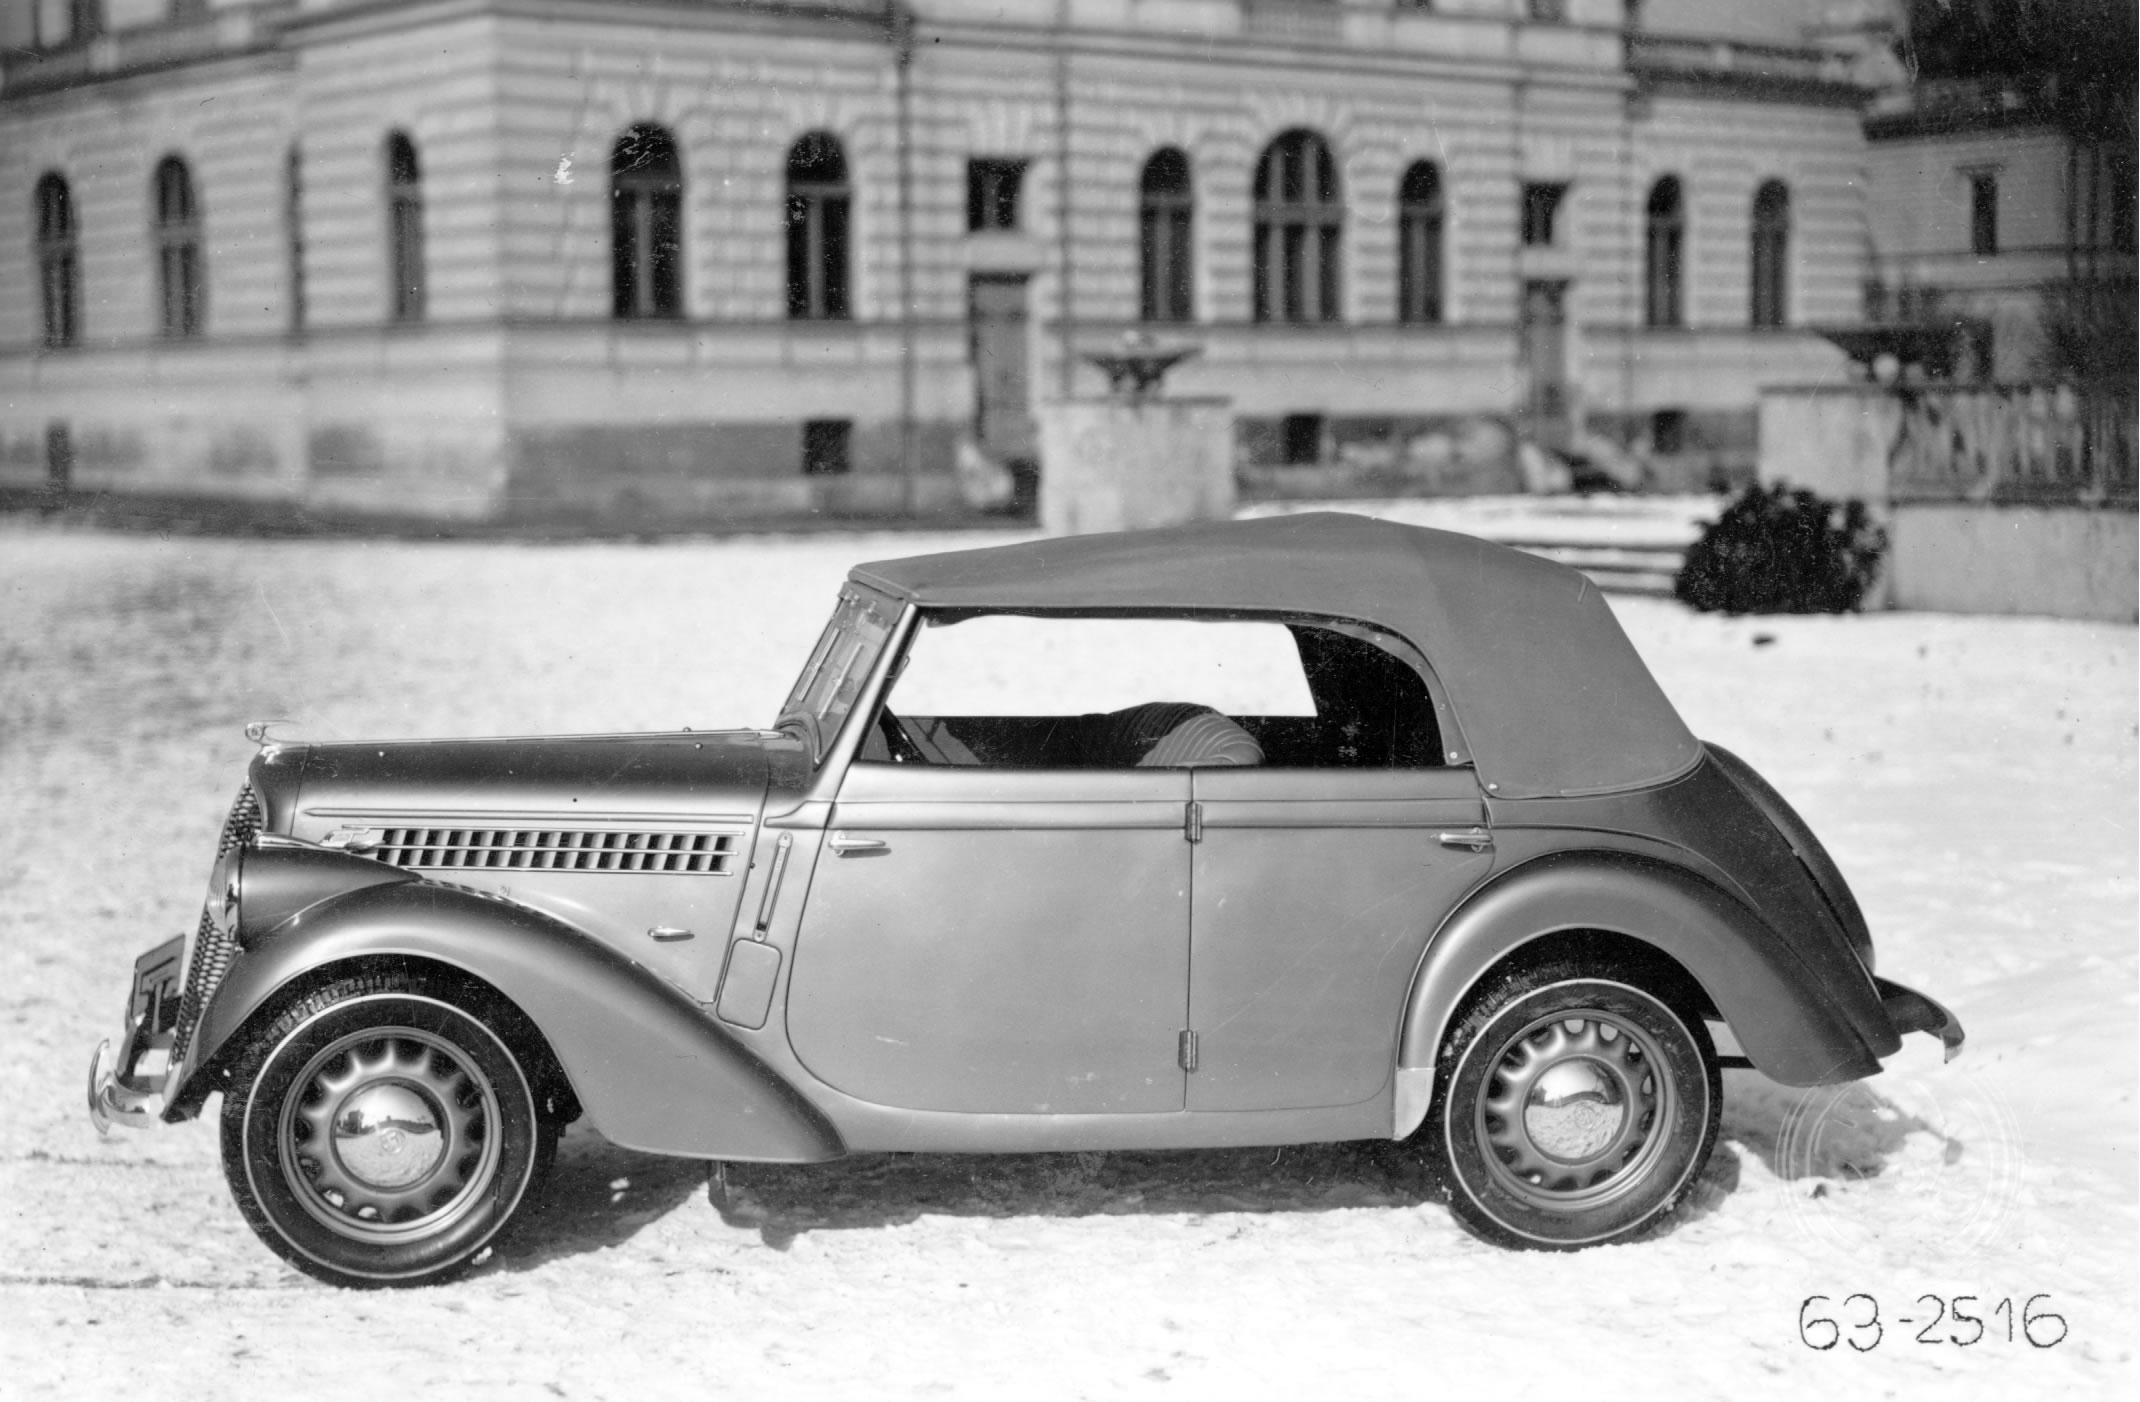 Skoda 1200 I 1952 - 1973 Sedan #2